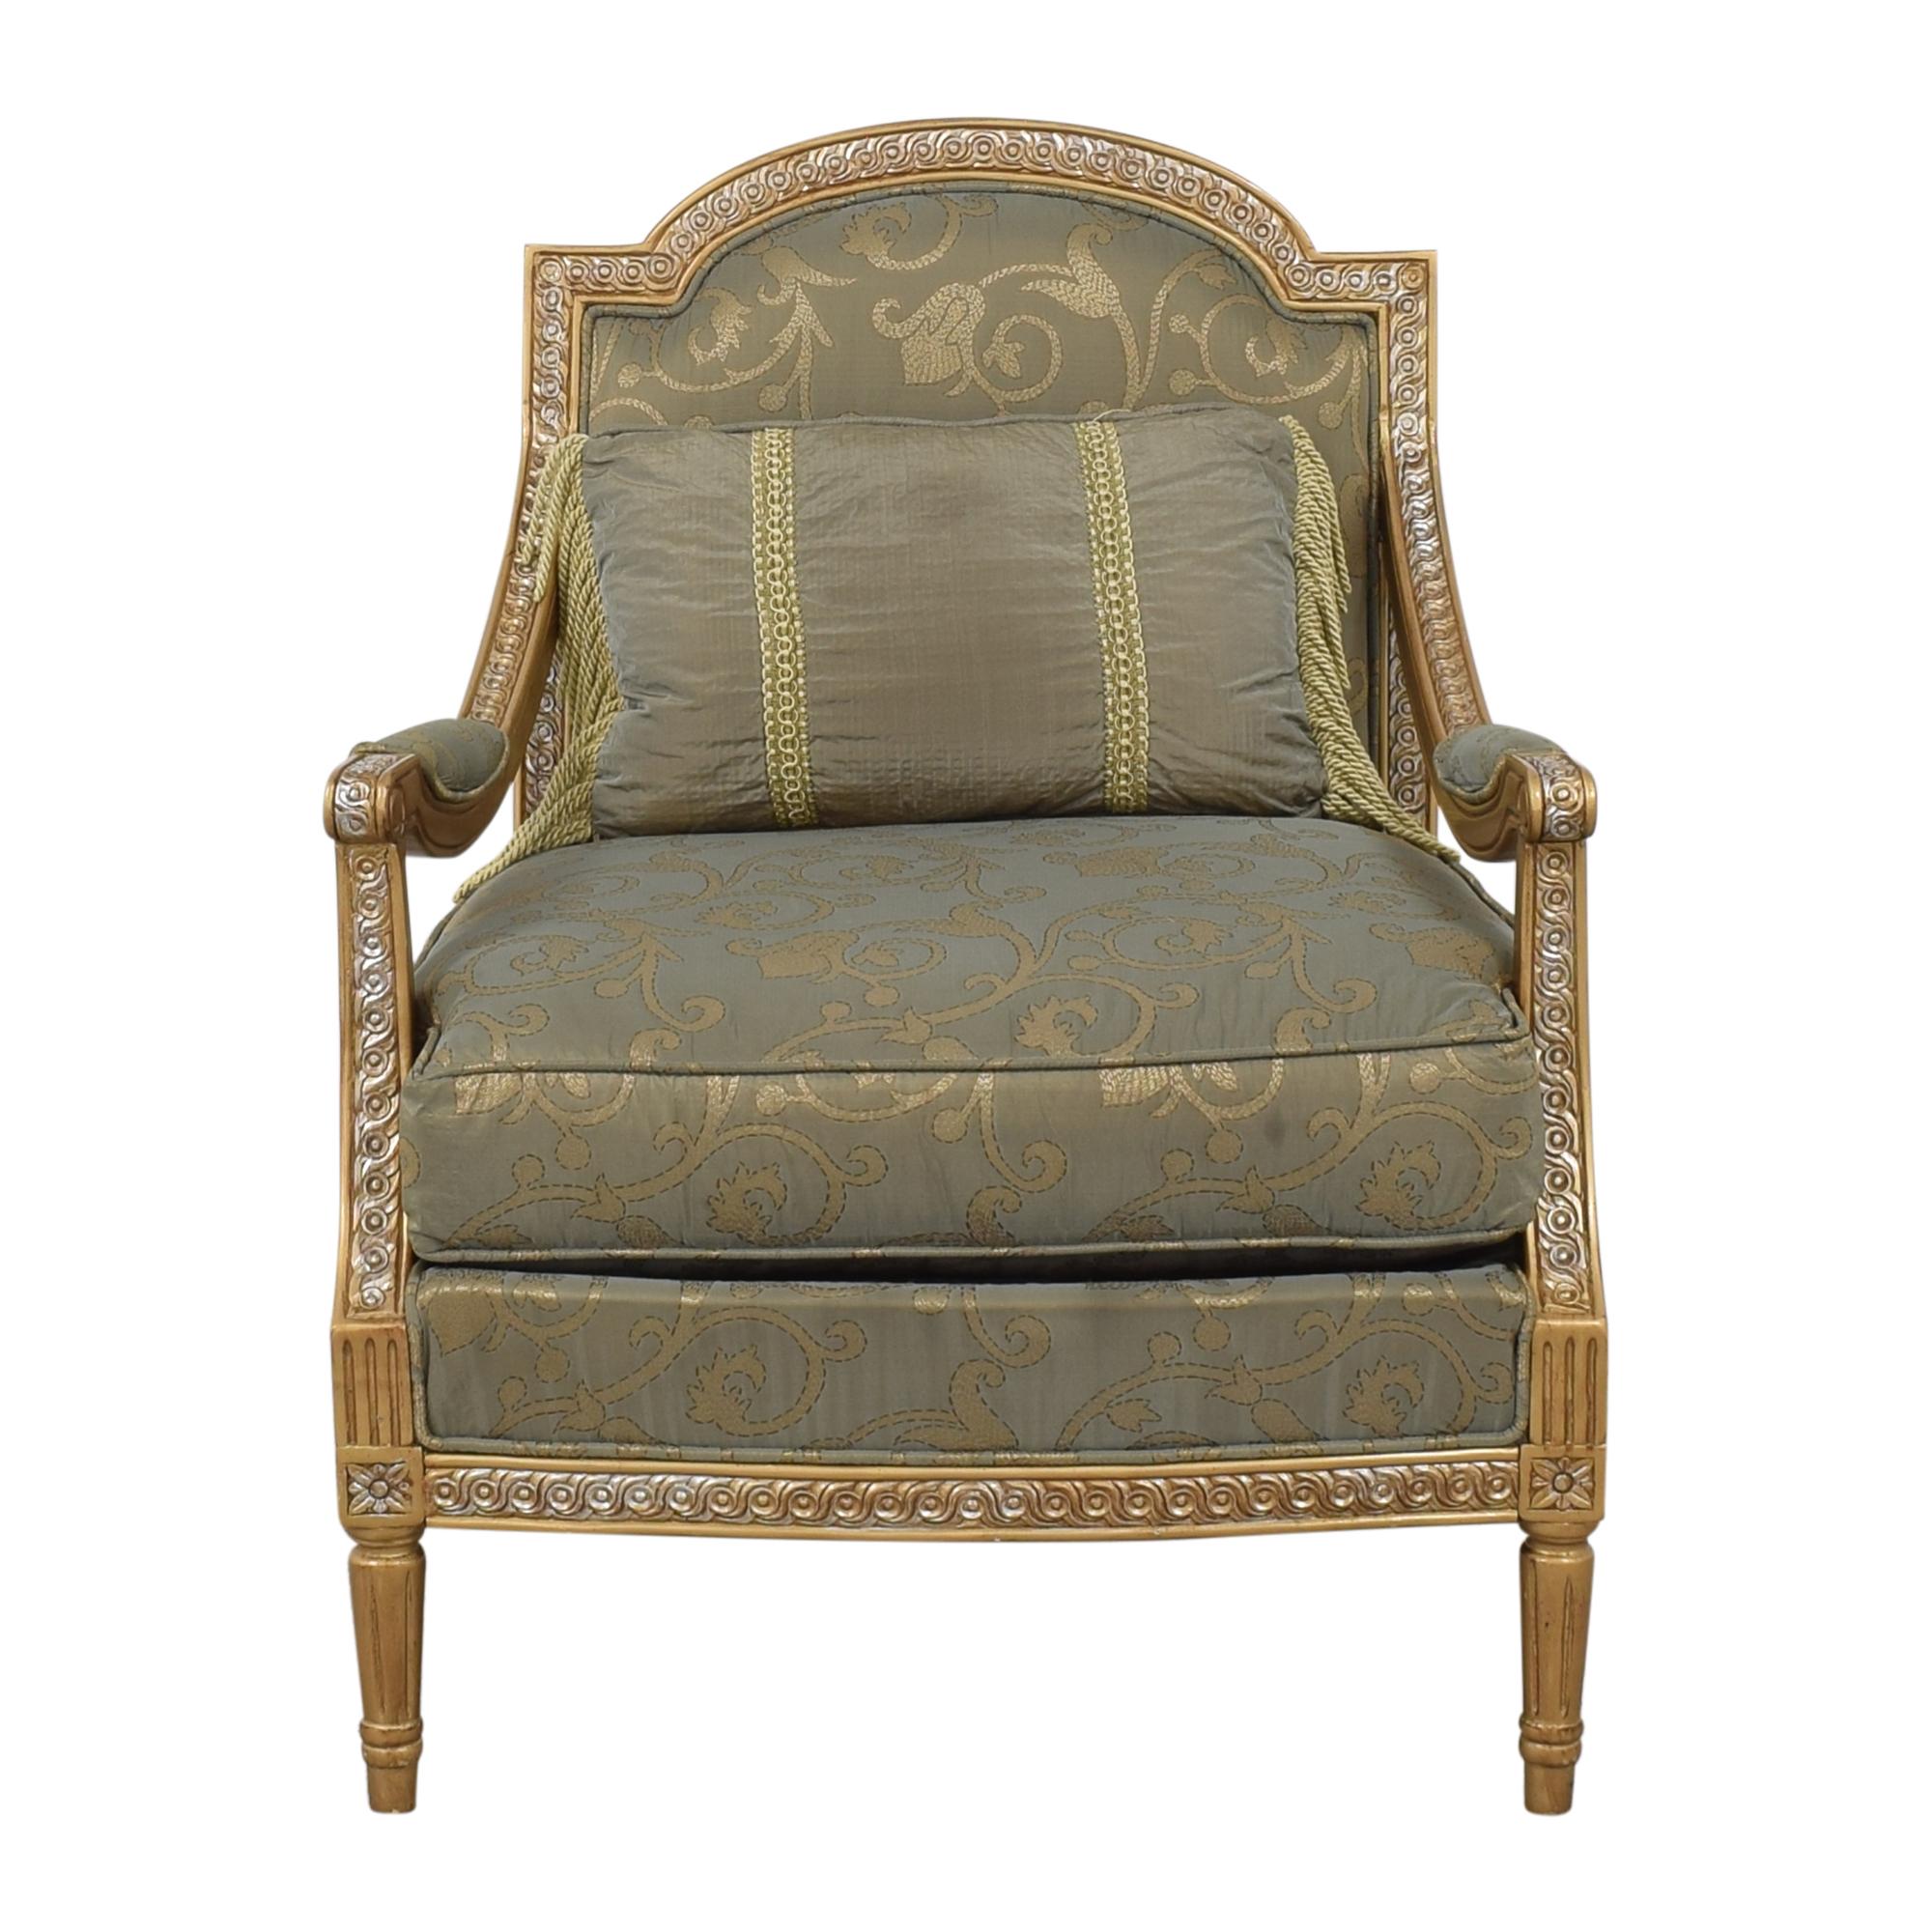 Safavieh Safavieh Romance Chair green & gold